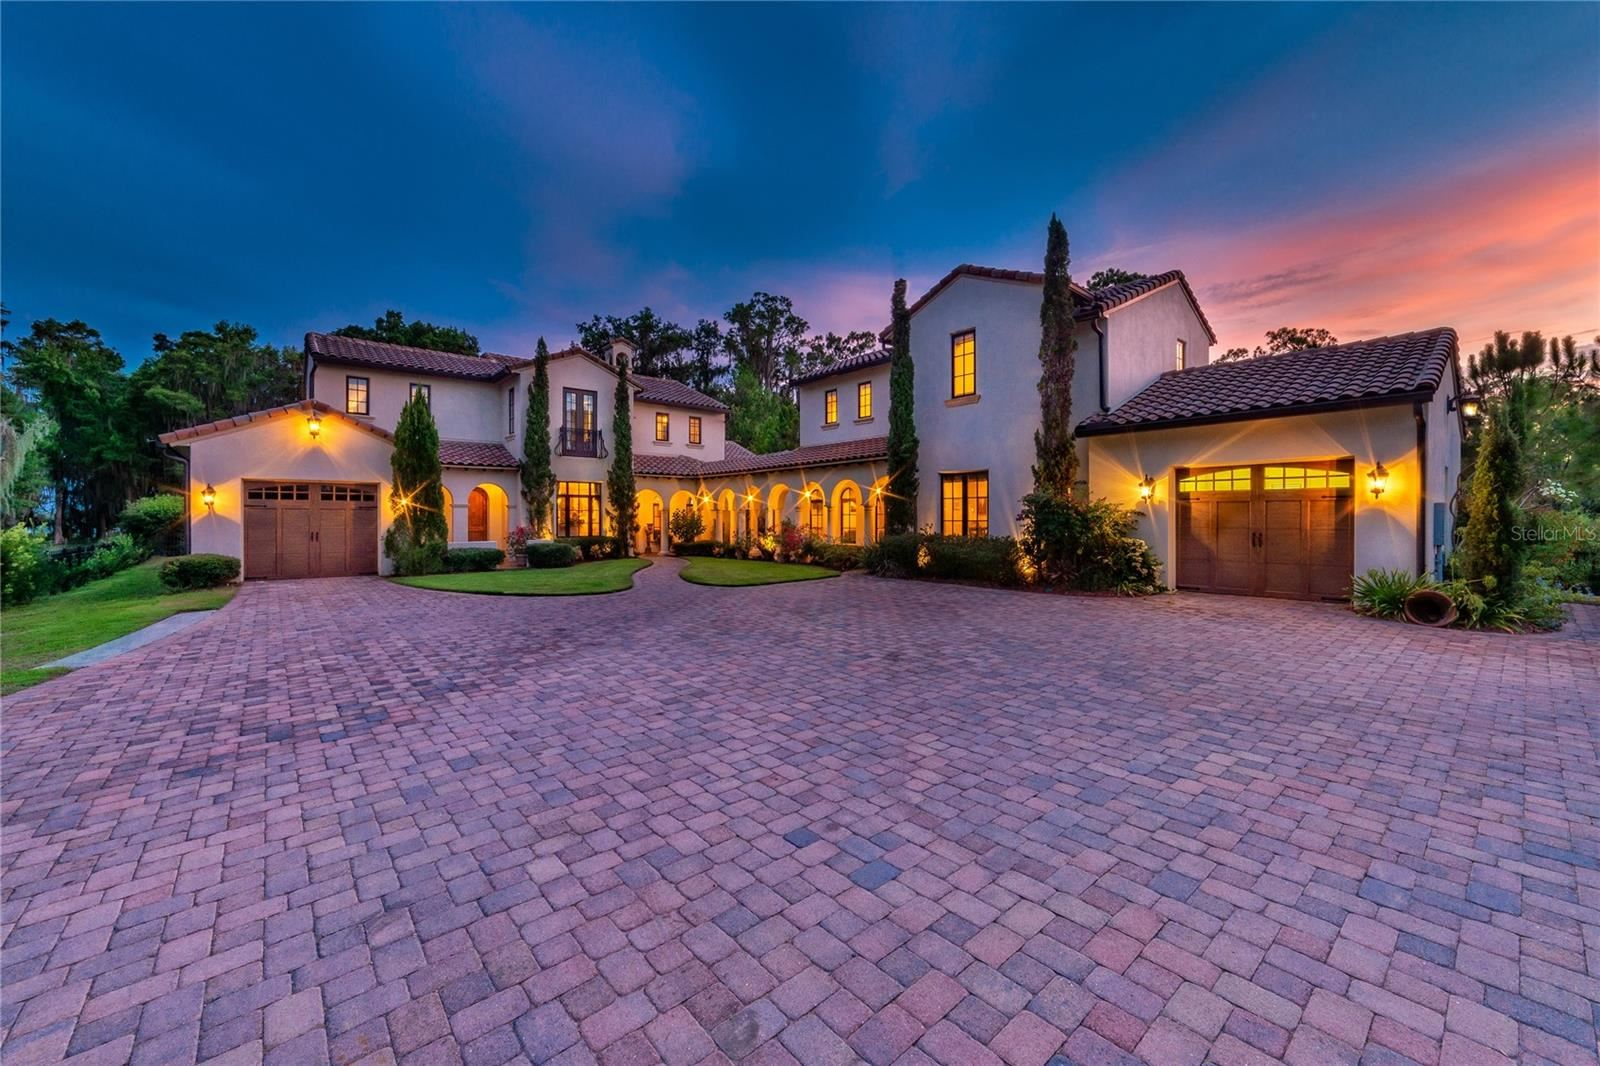 10552 KIRBY SMITH ROAD                                                                               Orlando                                                                      , FL - $2,975,000